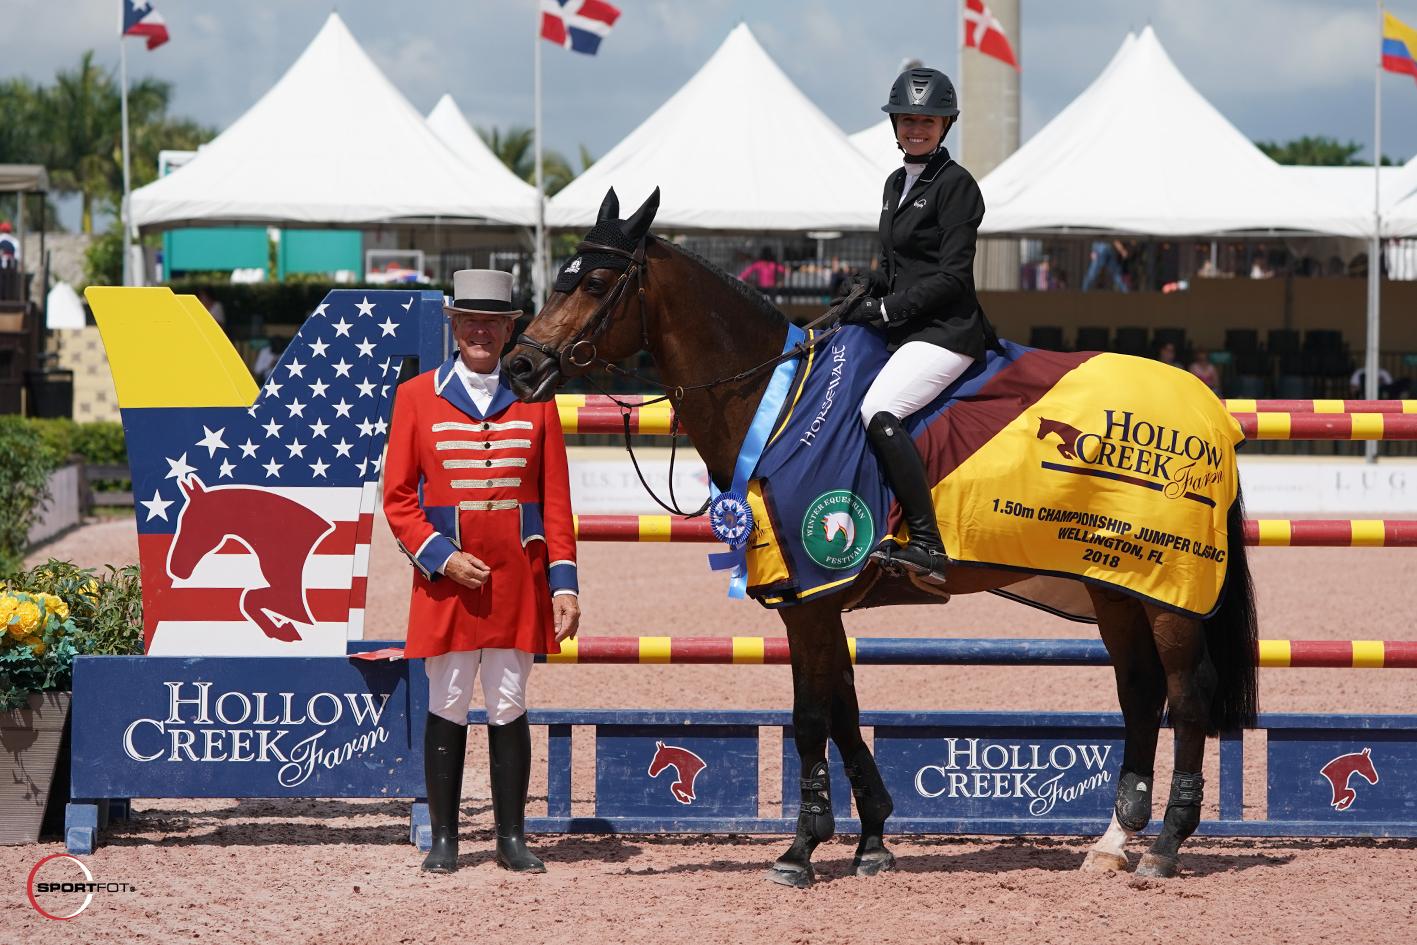 Tiffany Foster and Brighton pres 32003412 Sportfot